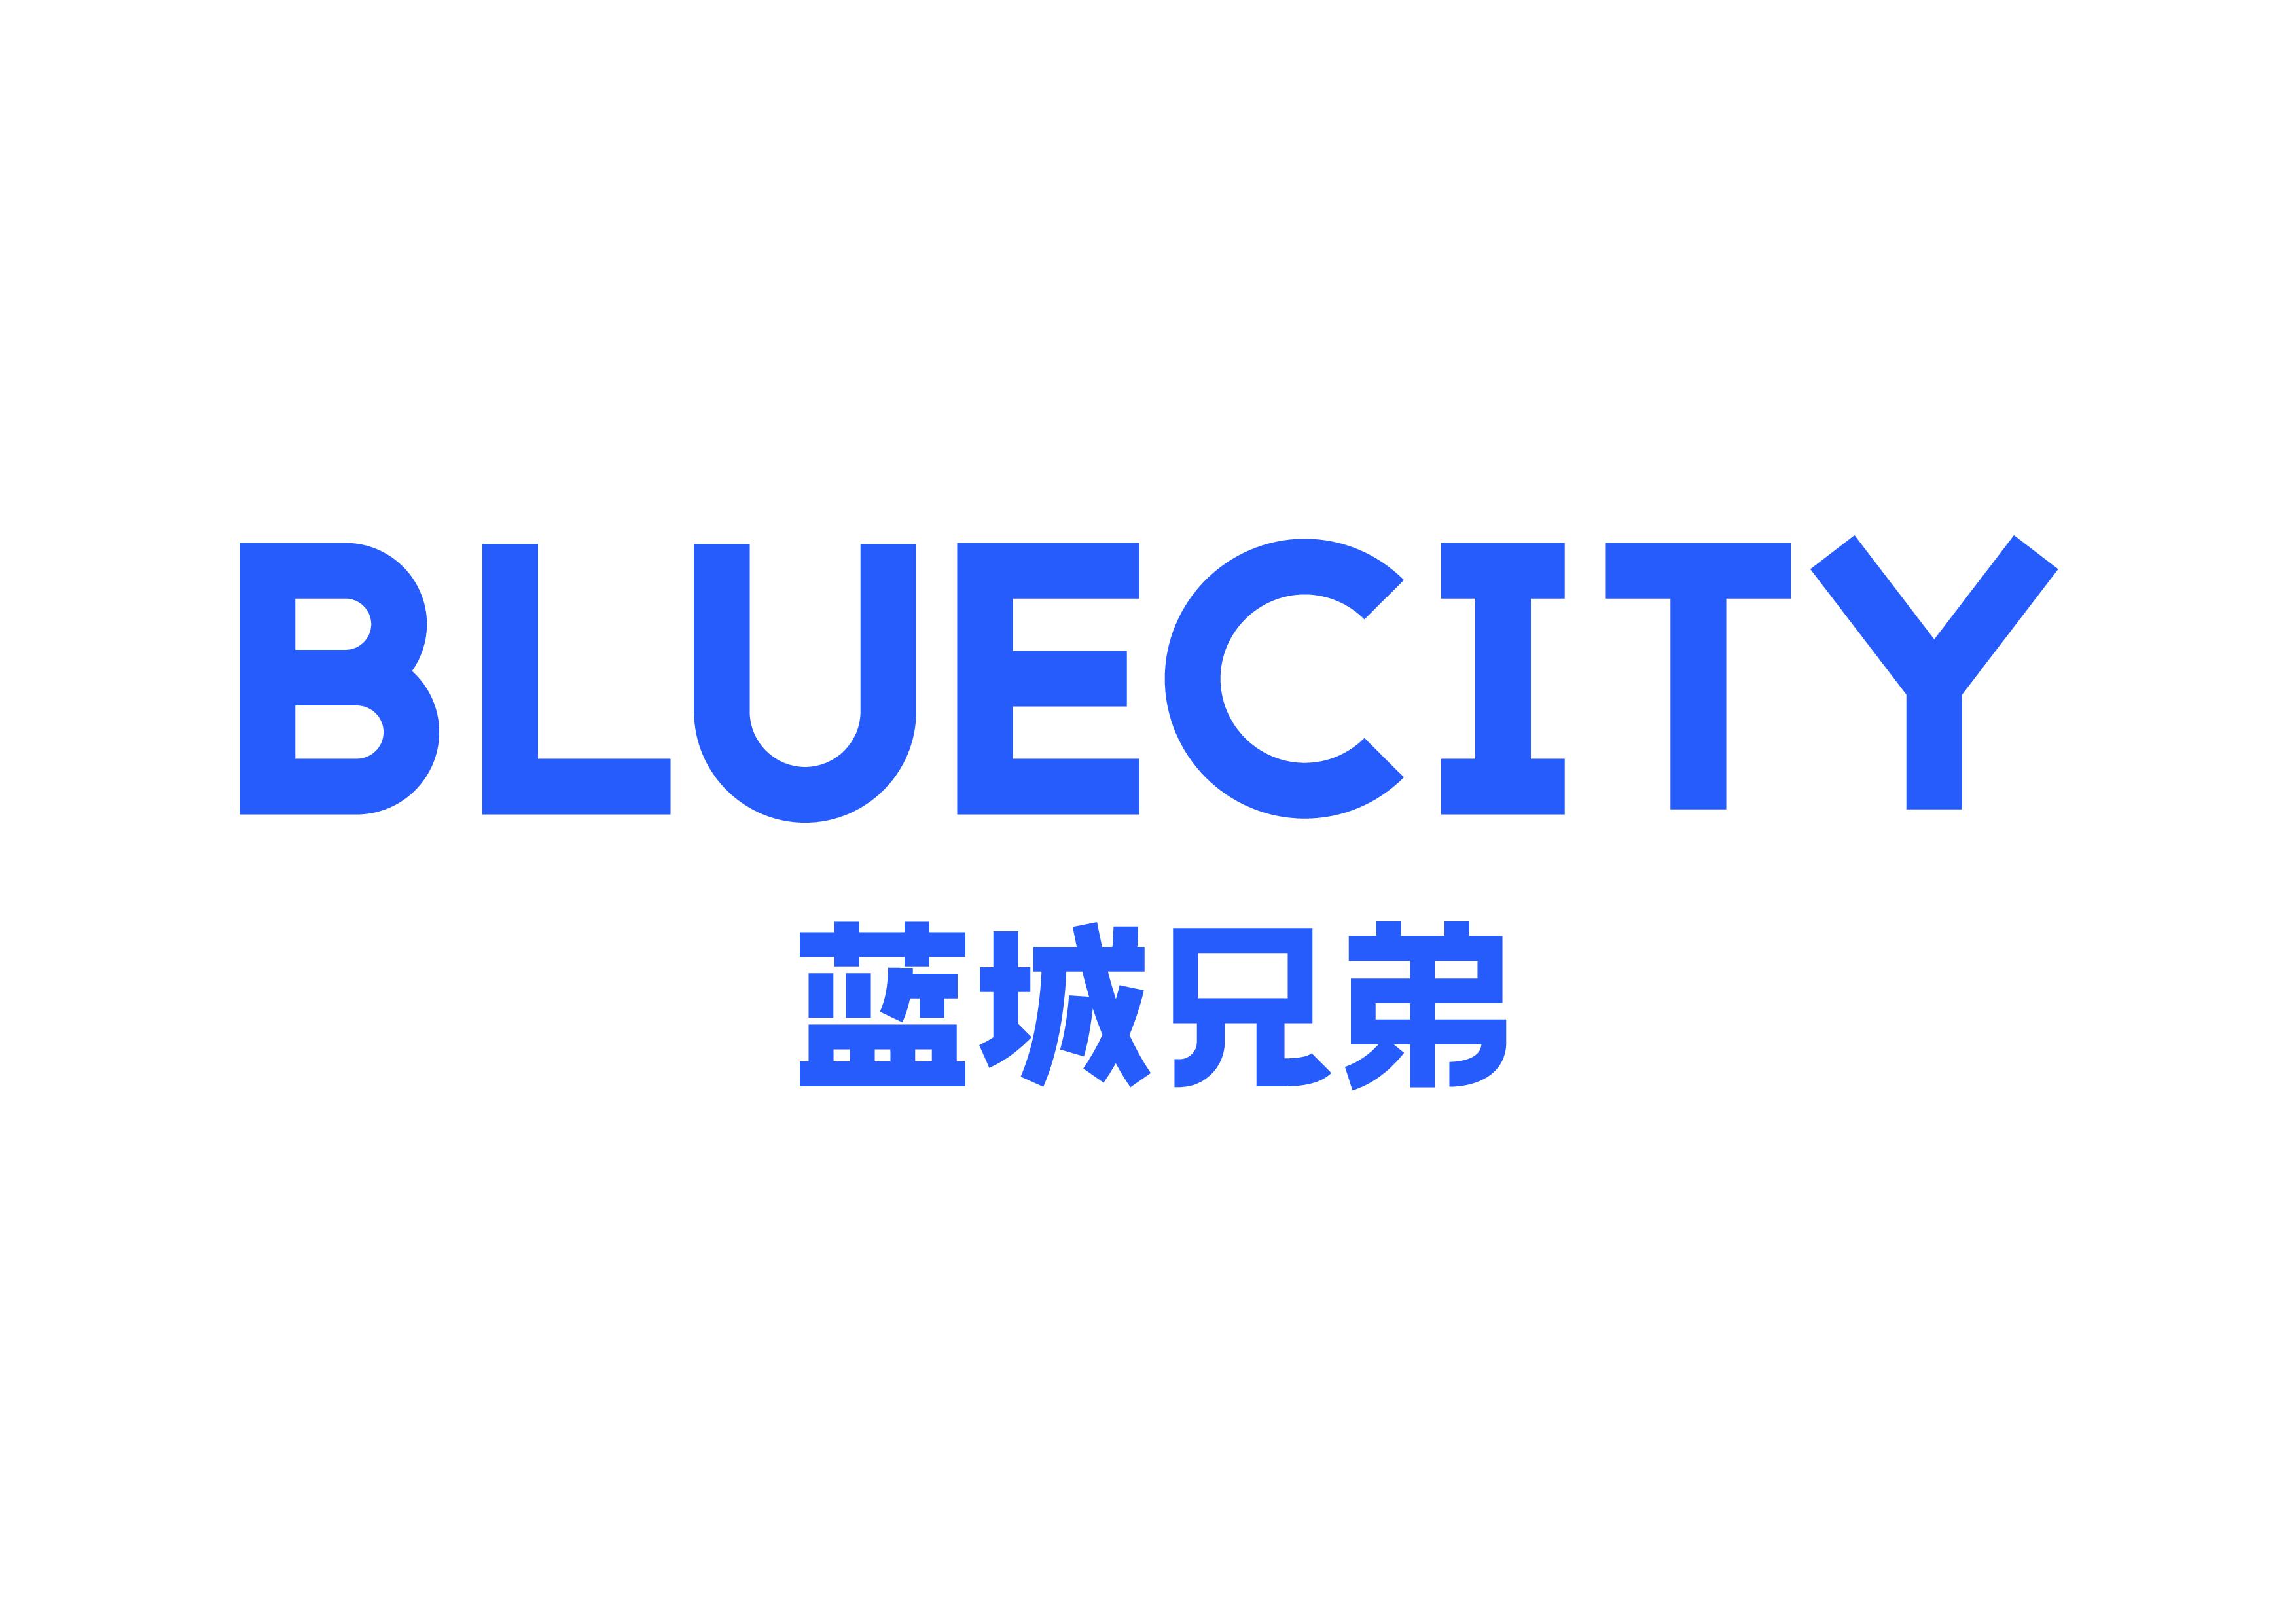 BlueCity's First Quarter Results Surpass Revenue Estimates